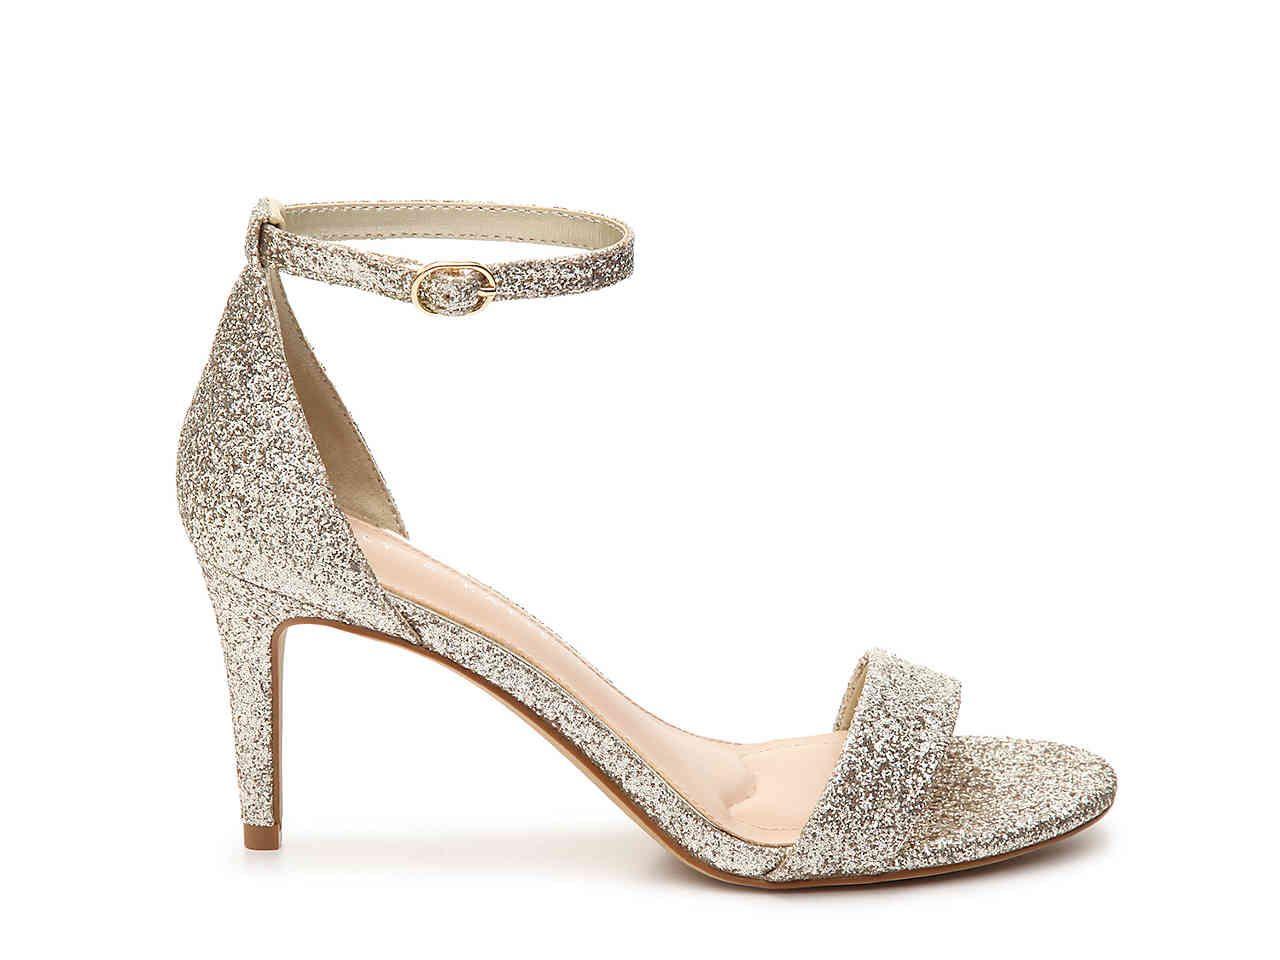 Kelly Katie Kirstie Sandal Women S Shoes Dsw Prom Shoes Sandals Shoes